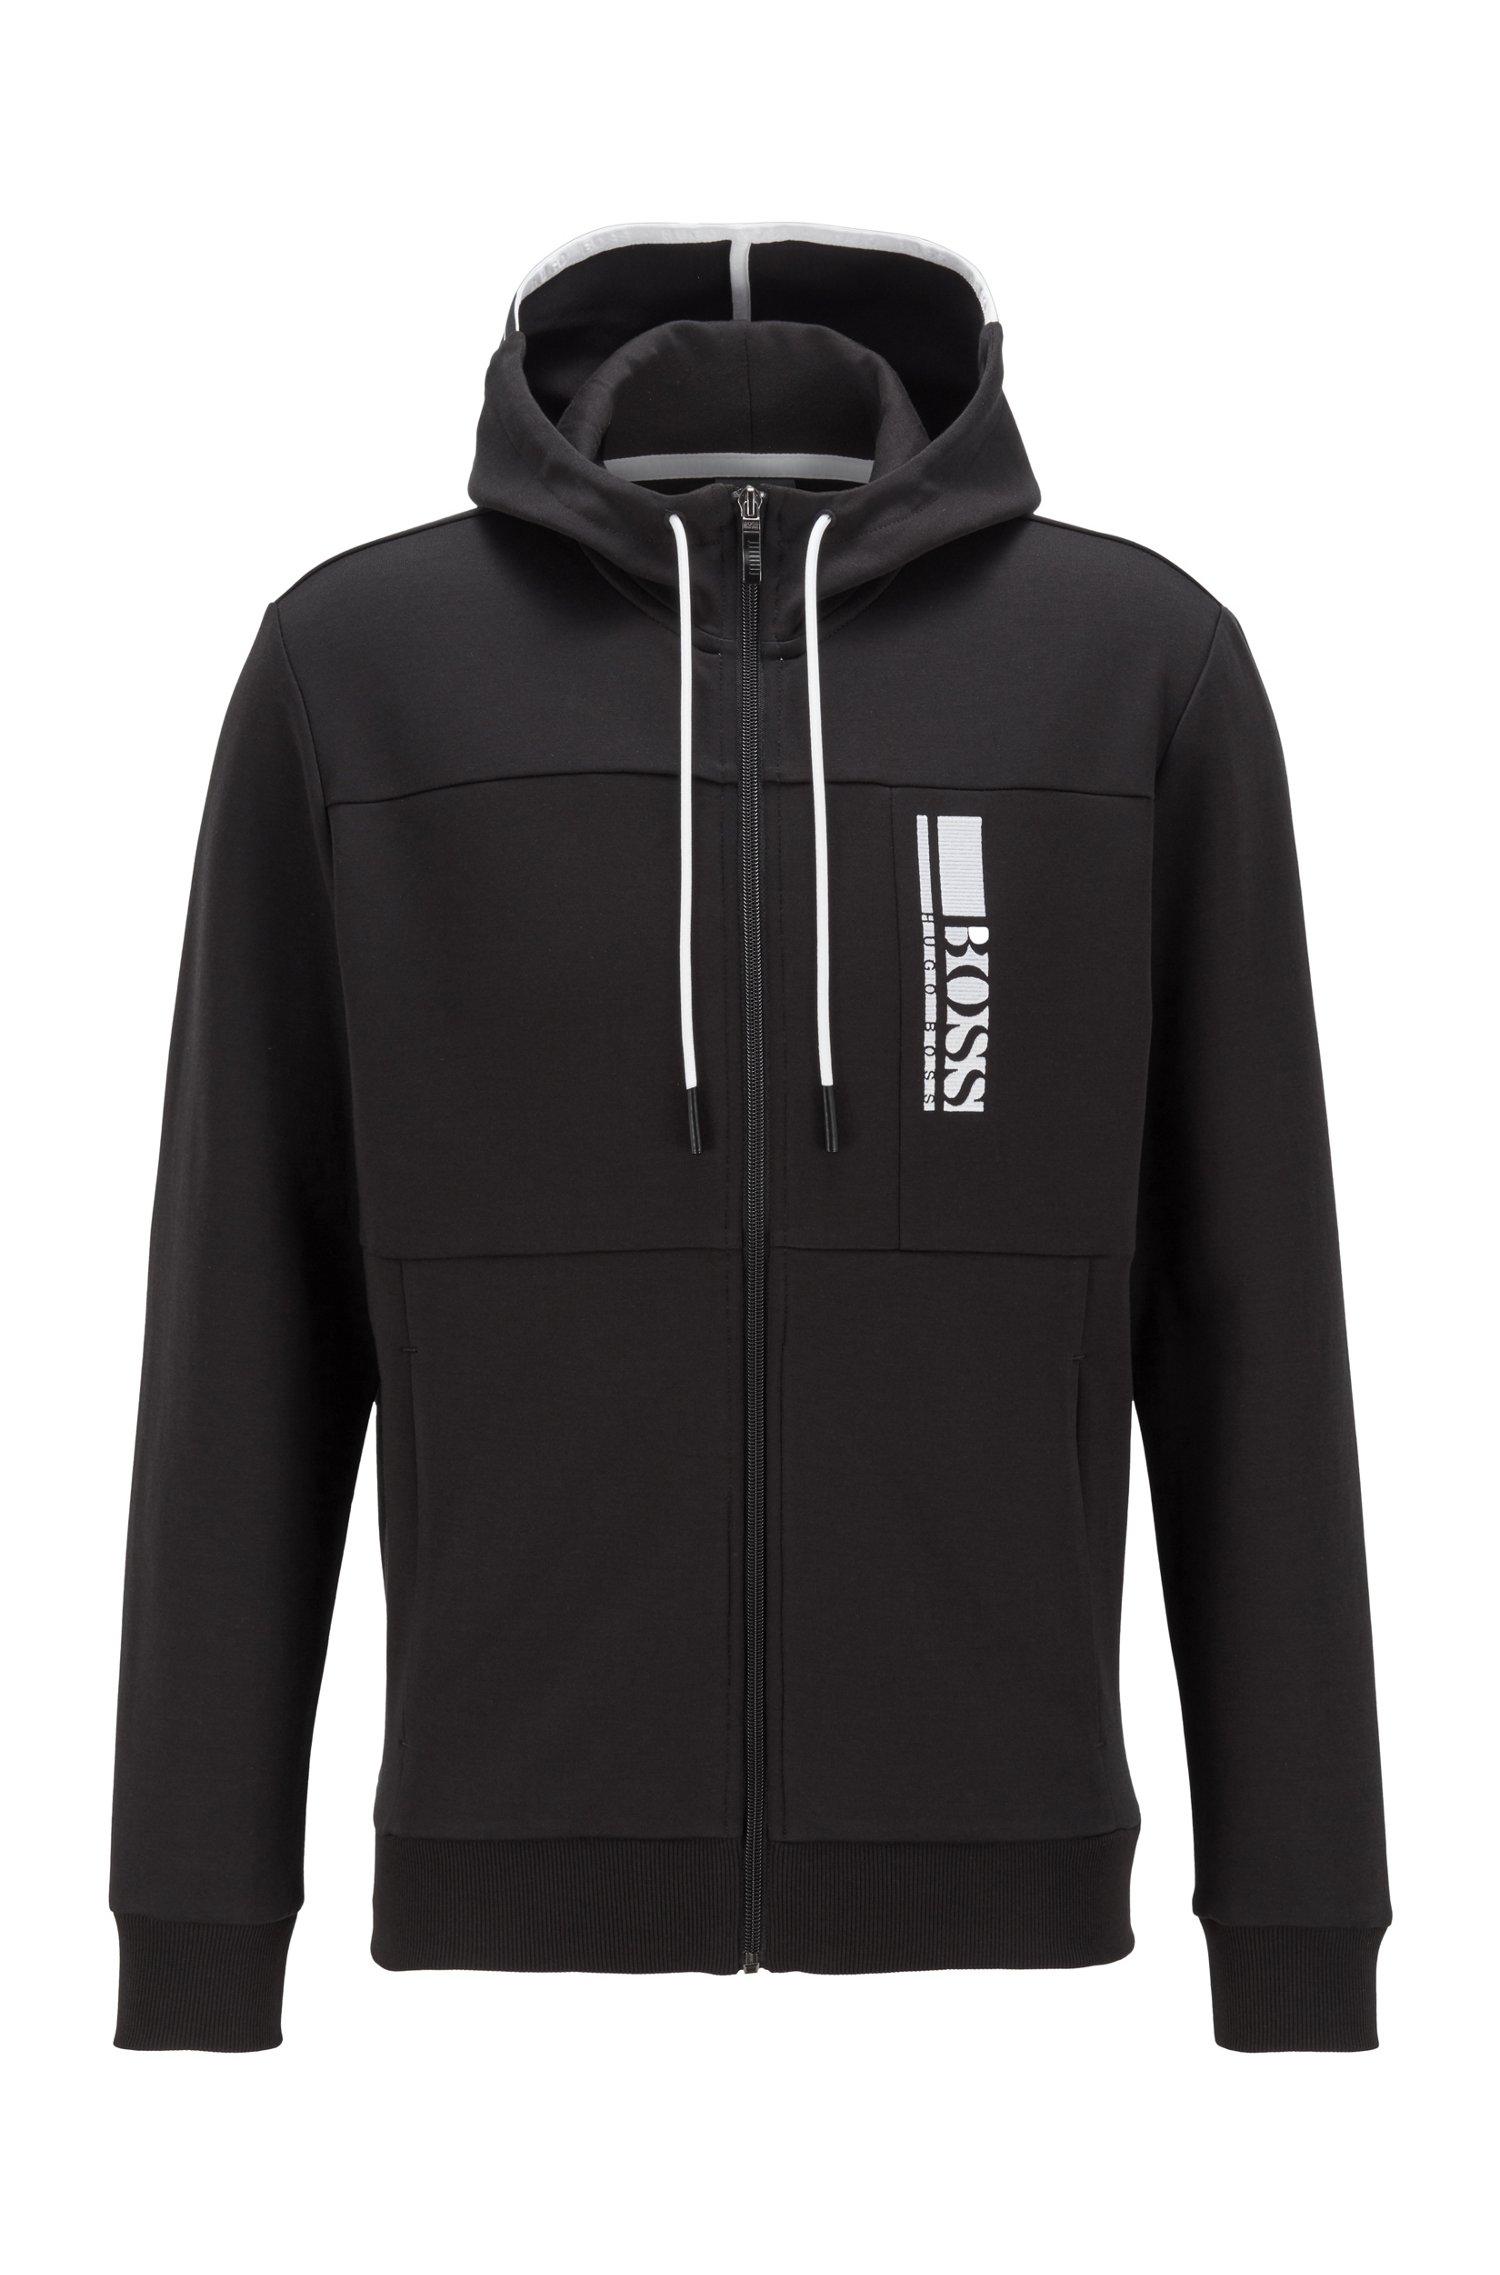 Interlock zip-through hooded sweatshirt with colour-block logo, Black